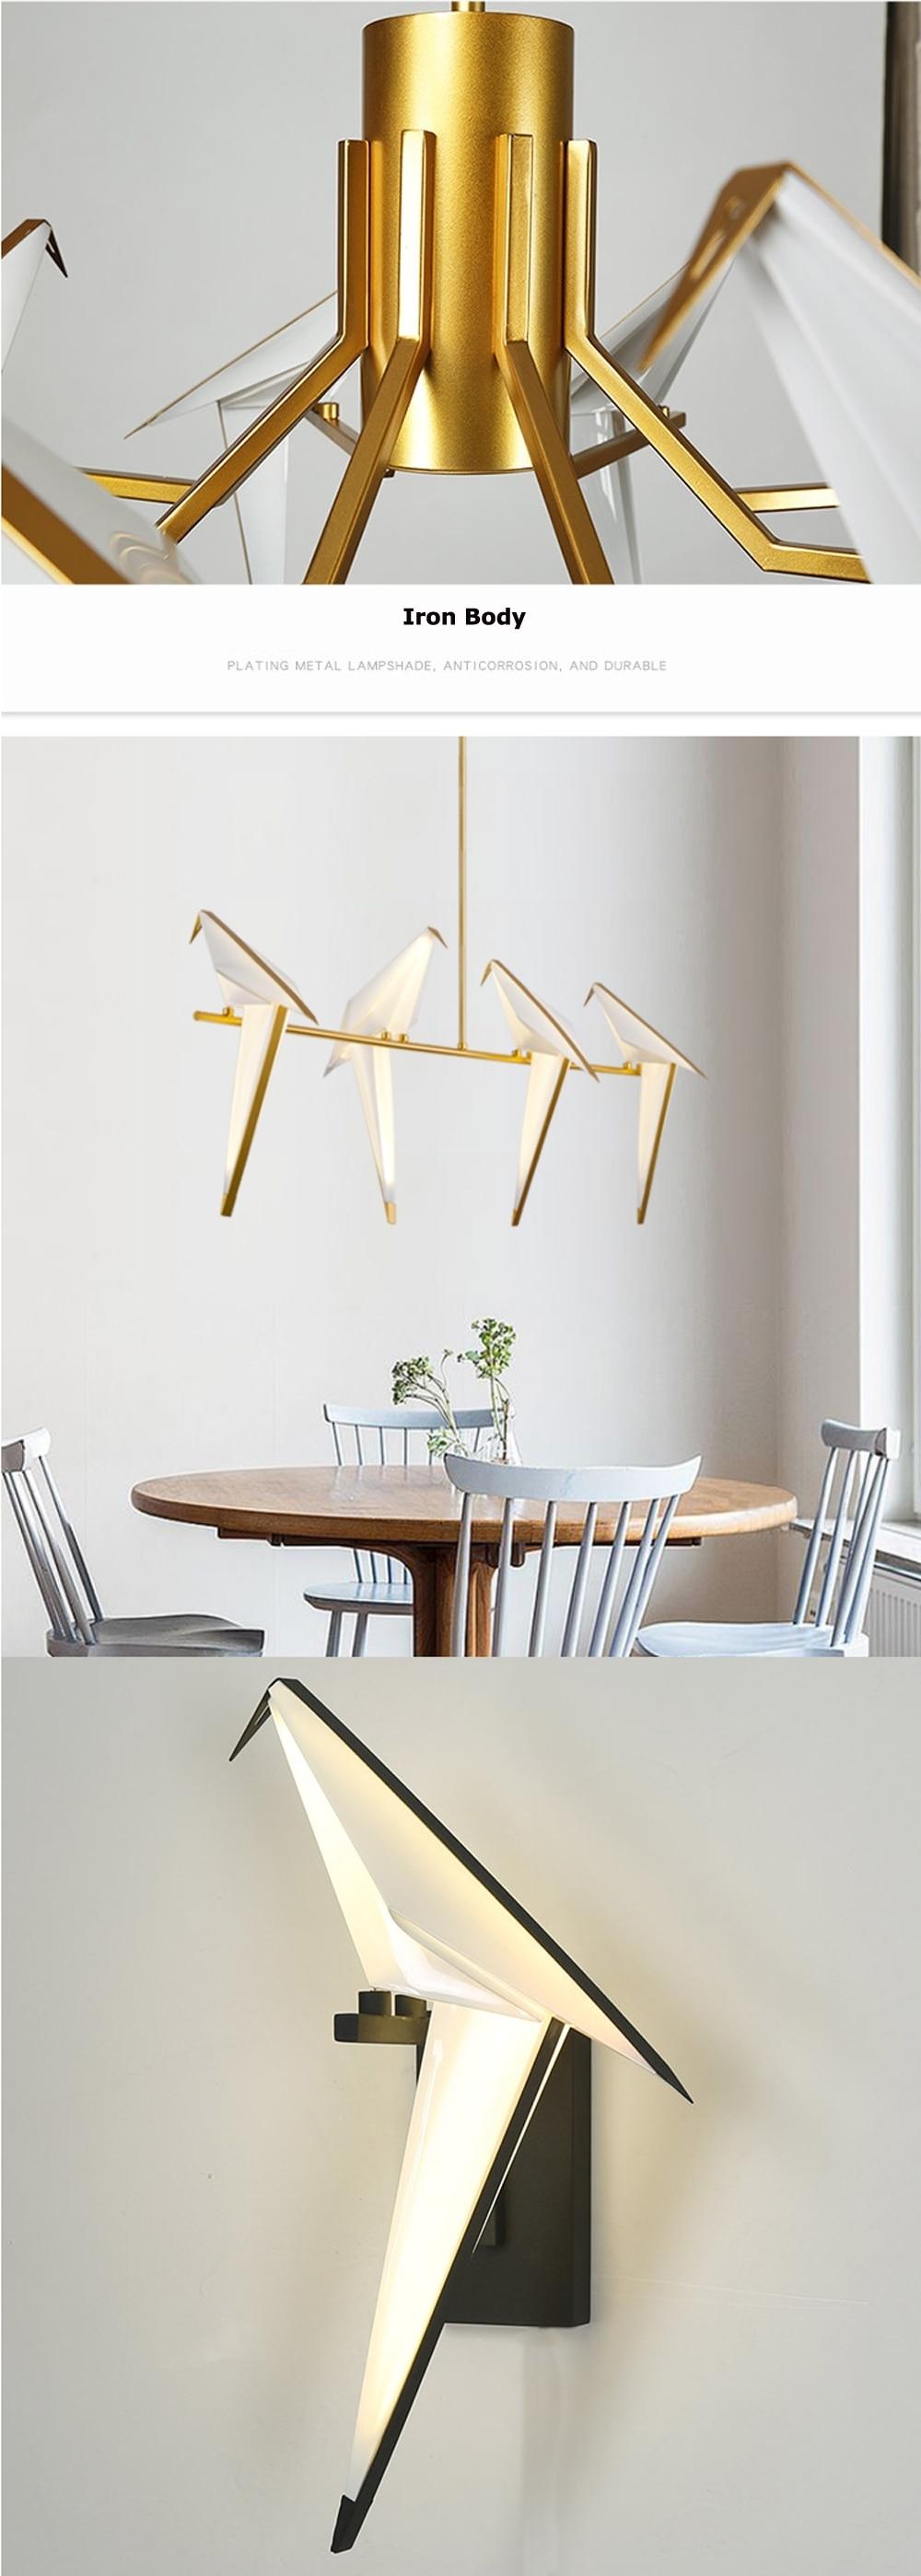 Hfcaae8eba1e74d4c842f124720f373dda - LED Postmodern Iron Acryl Love Bird LED Lamp LED Light Wall lamp Wall Light Wall Sconce For Bedroom Corridor